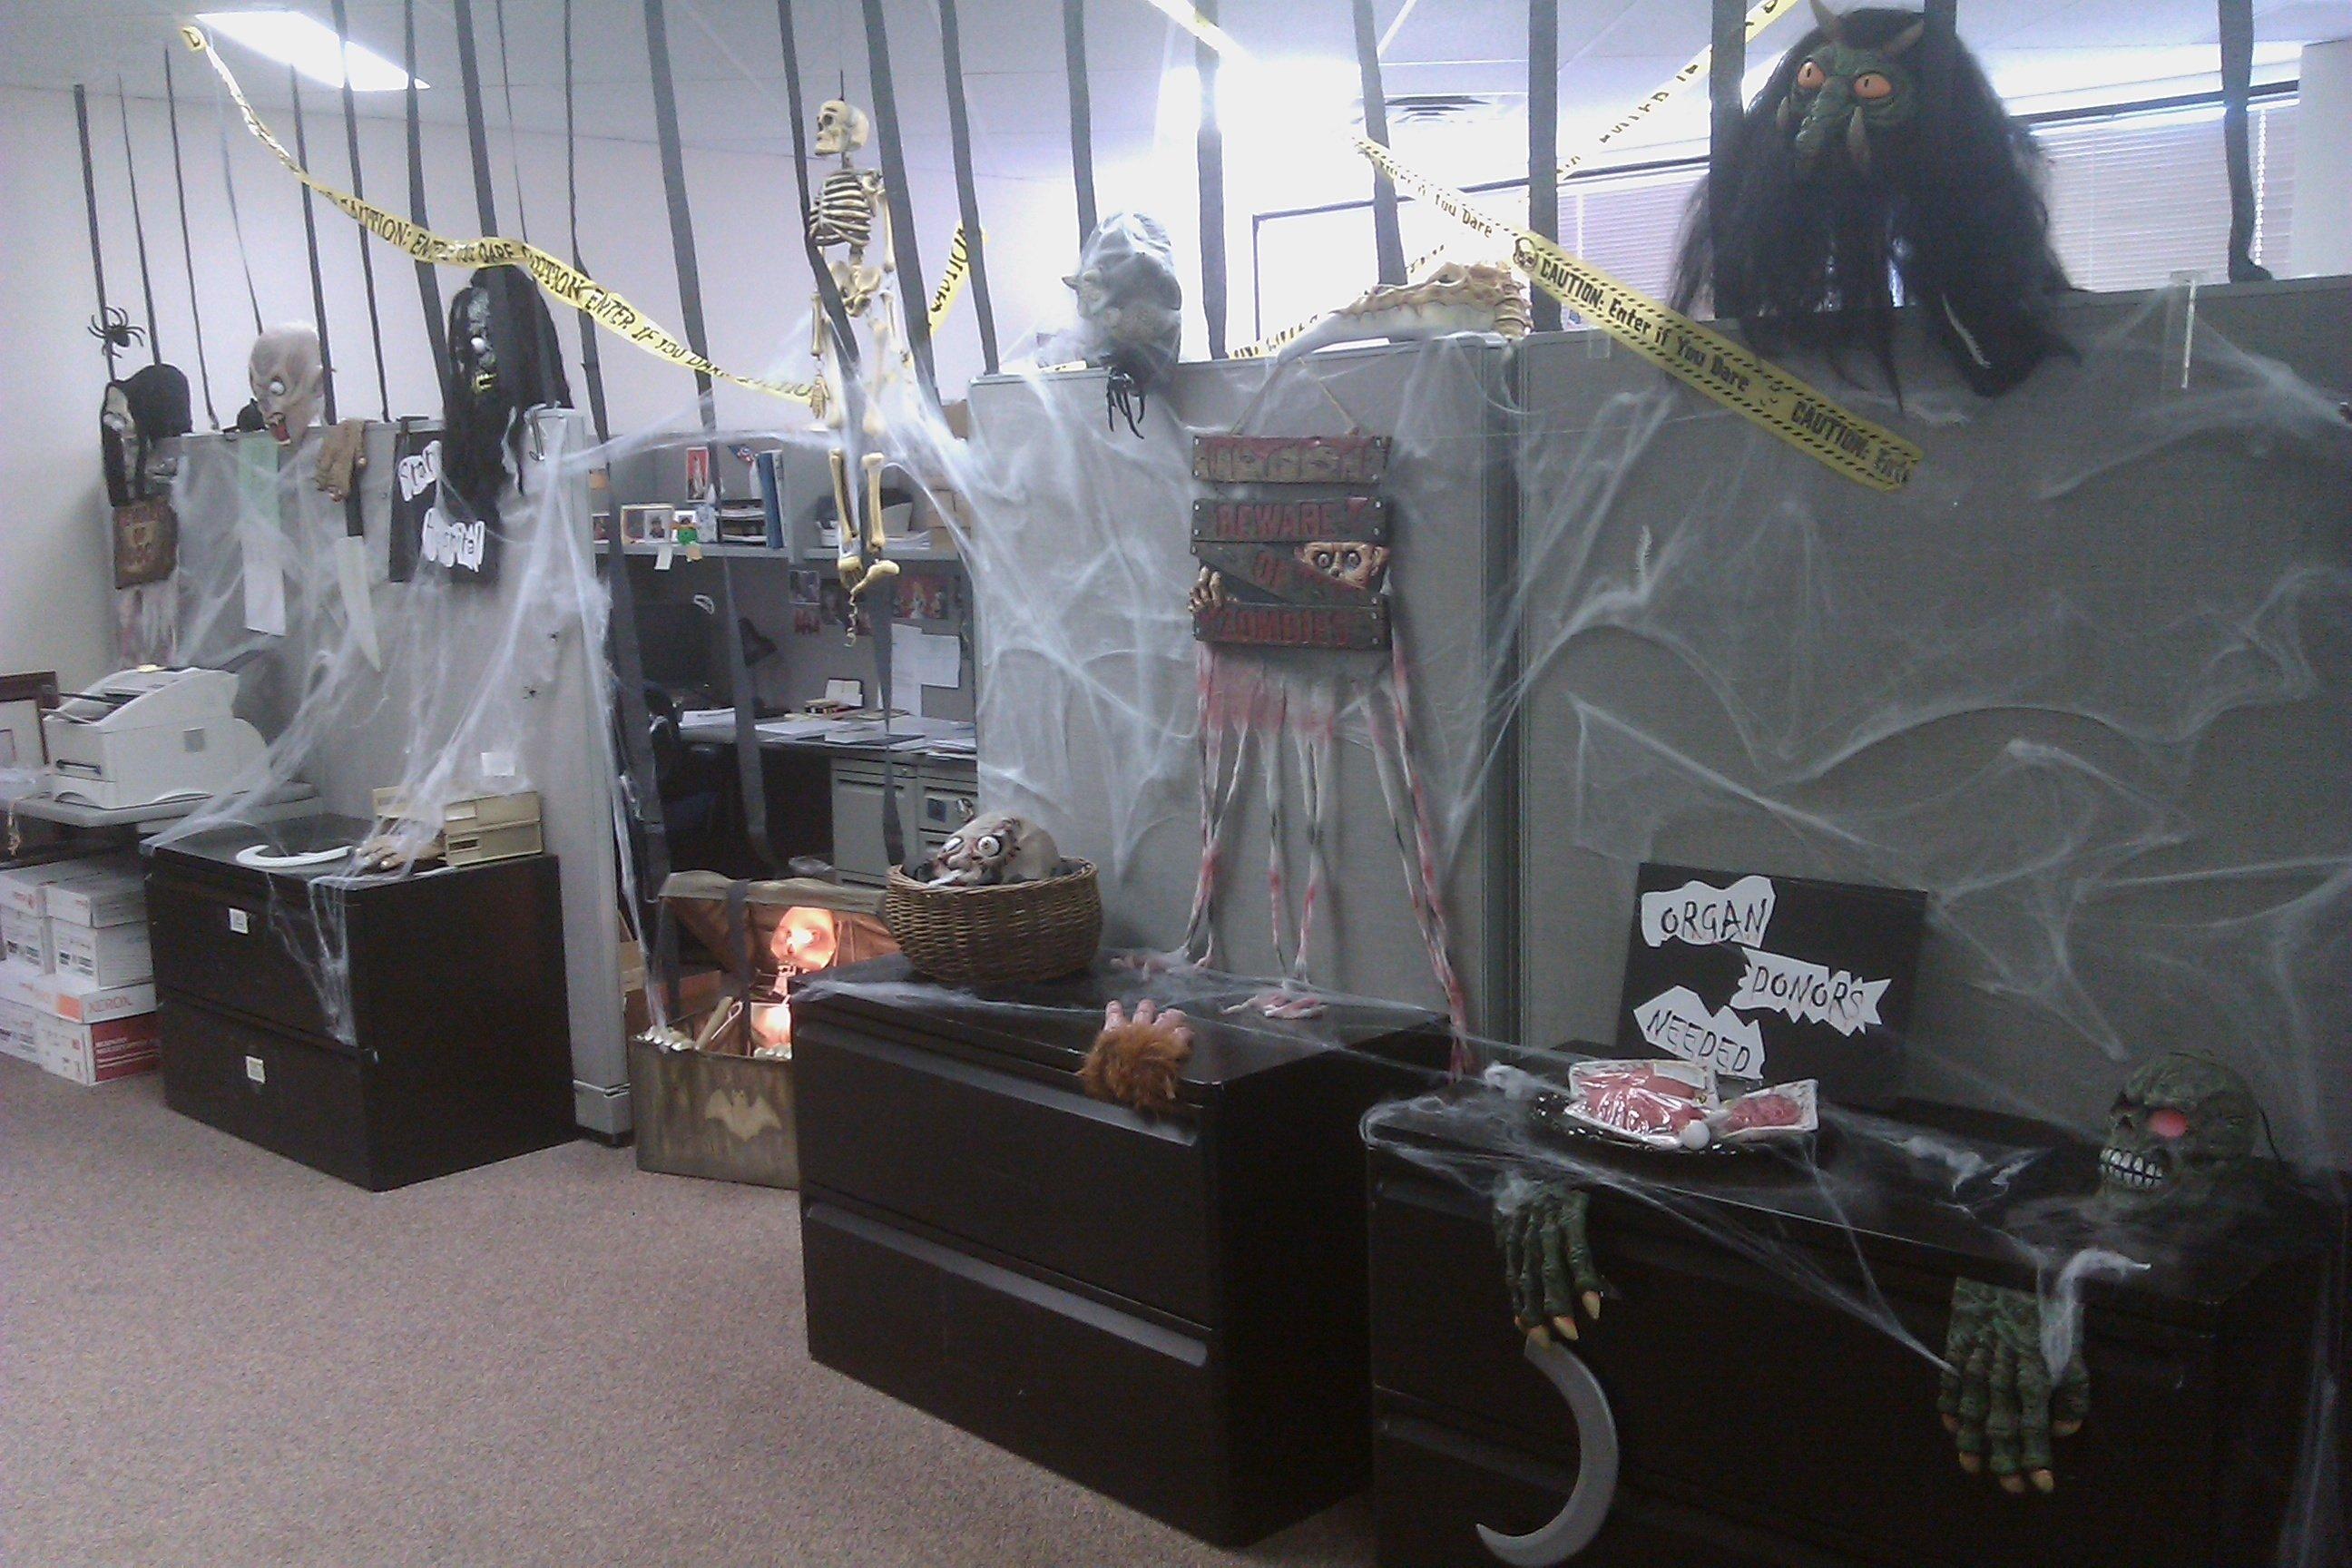 Genial 10 Amazing Halloween Decorating Ideas For The Office Halloween Office  Decorating Ideas Easy Halloween Decorations